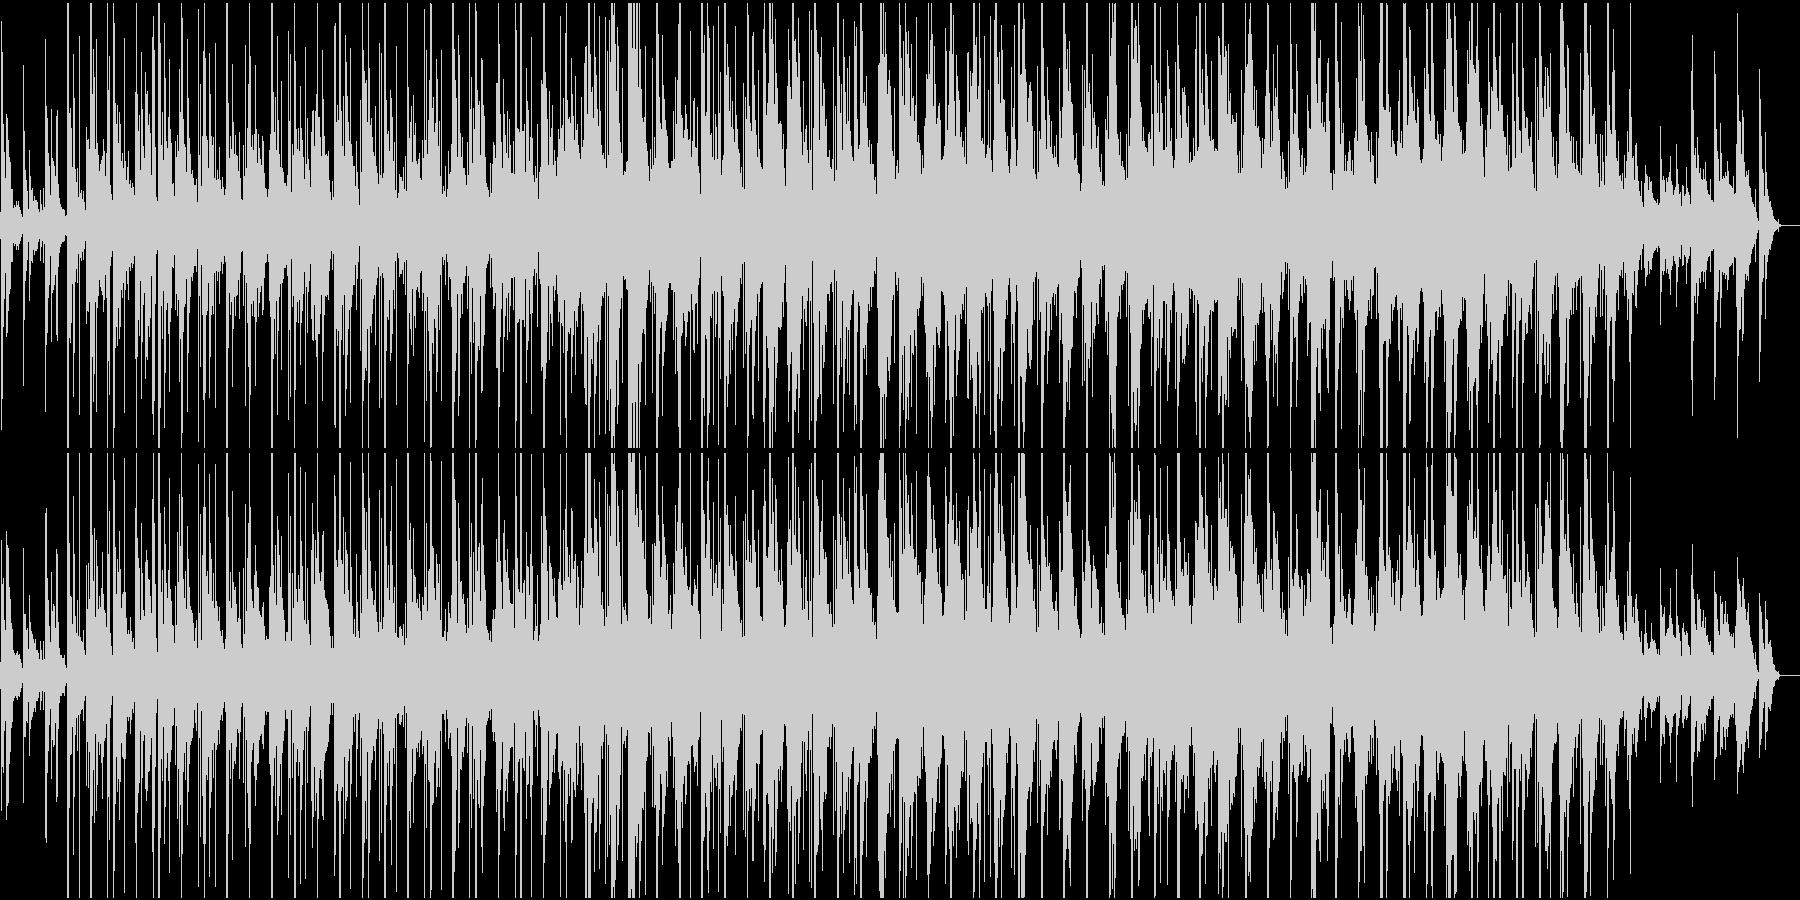 ACROSS THE RIVERの未再生の波形